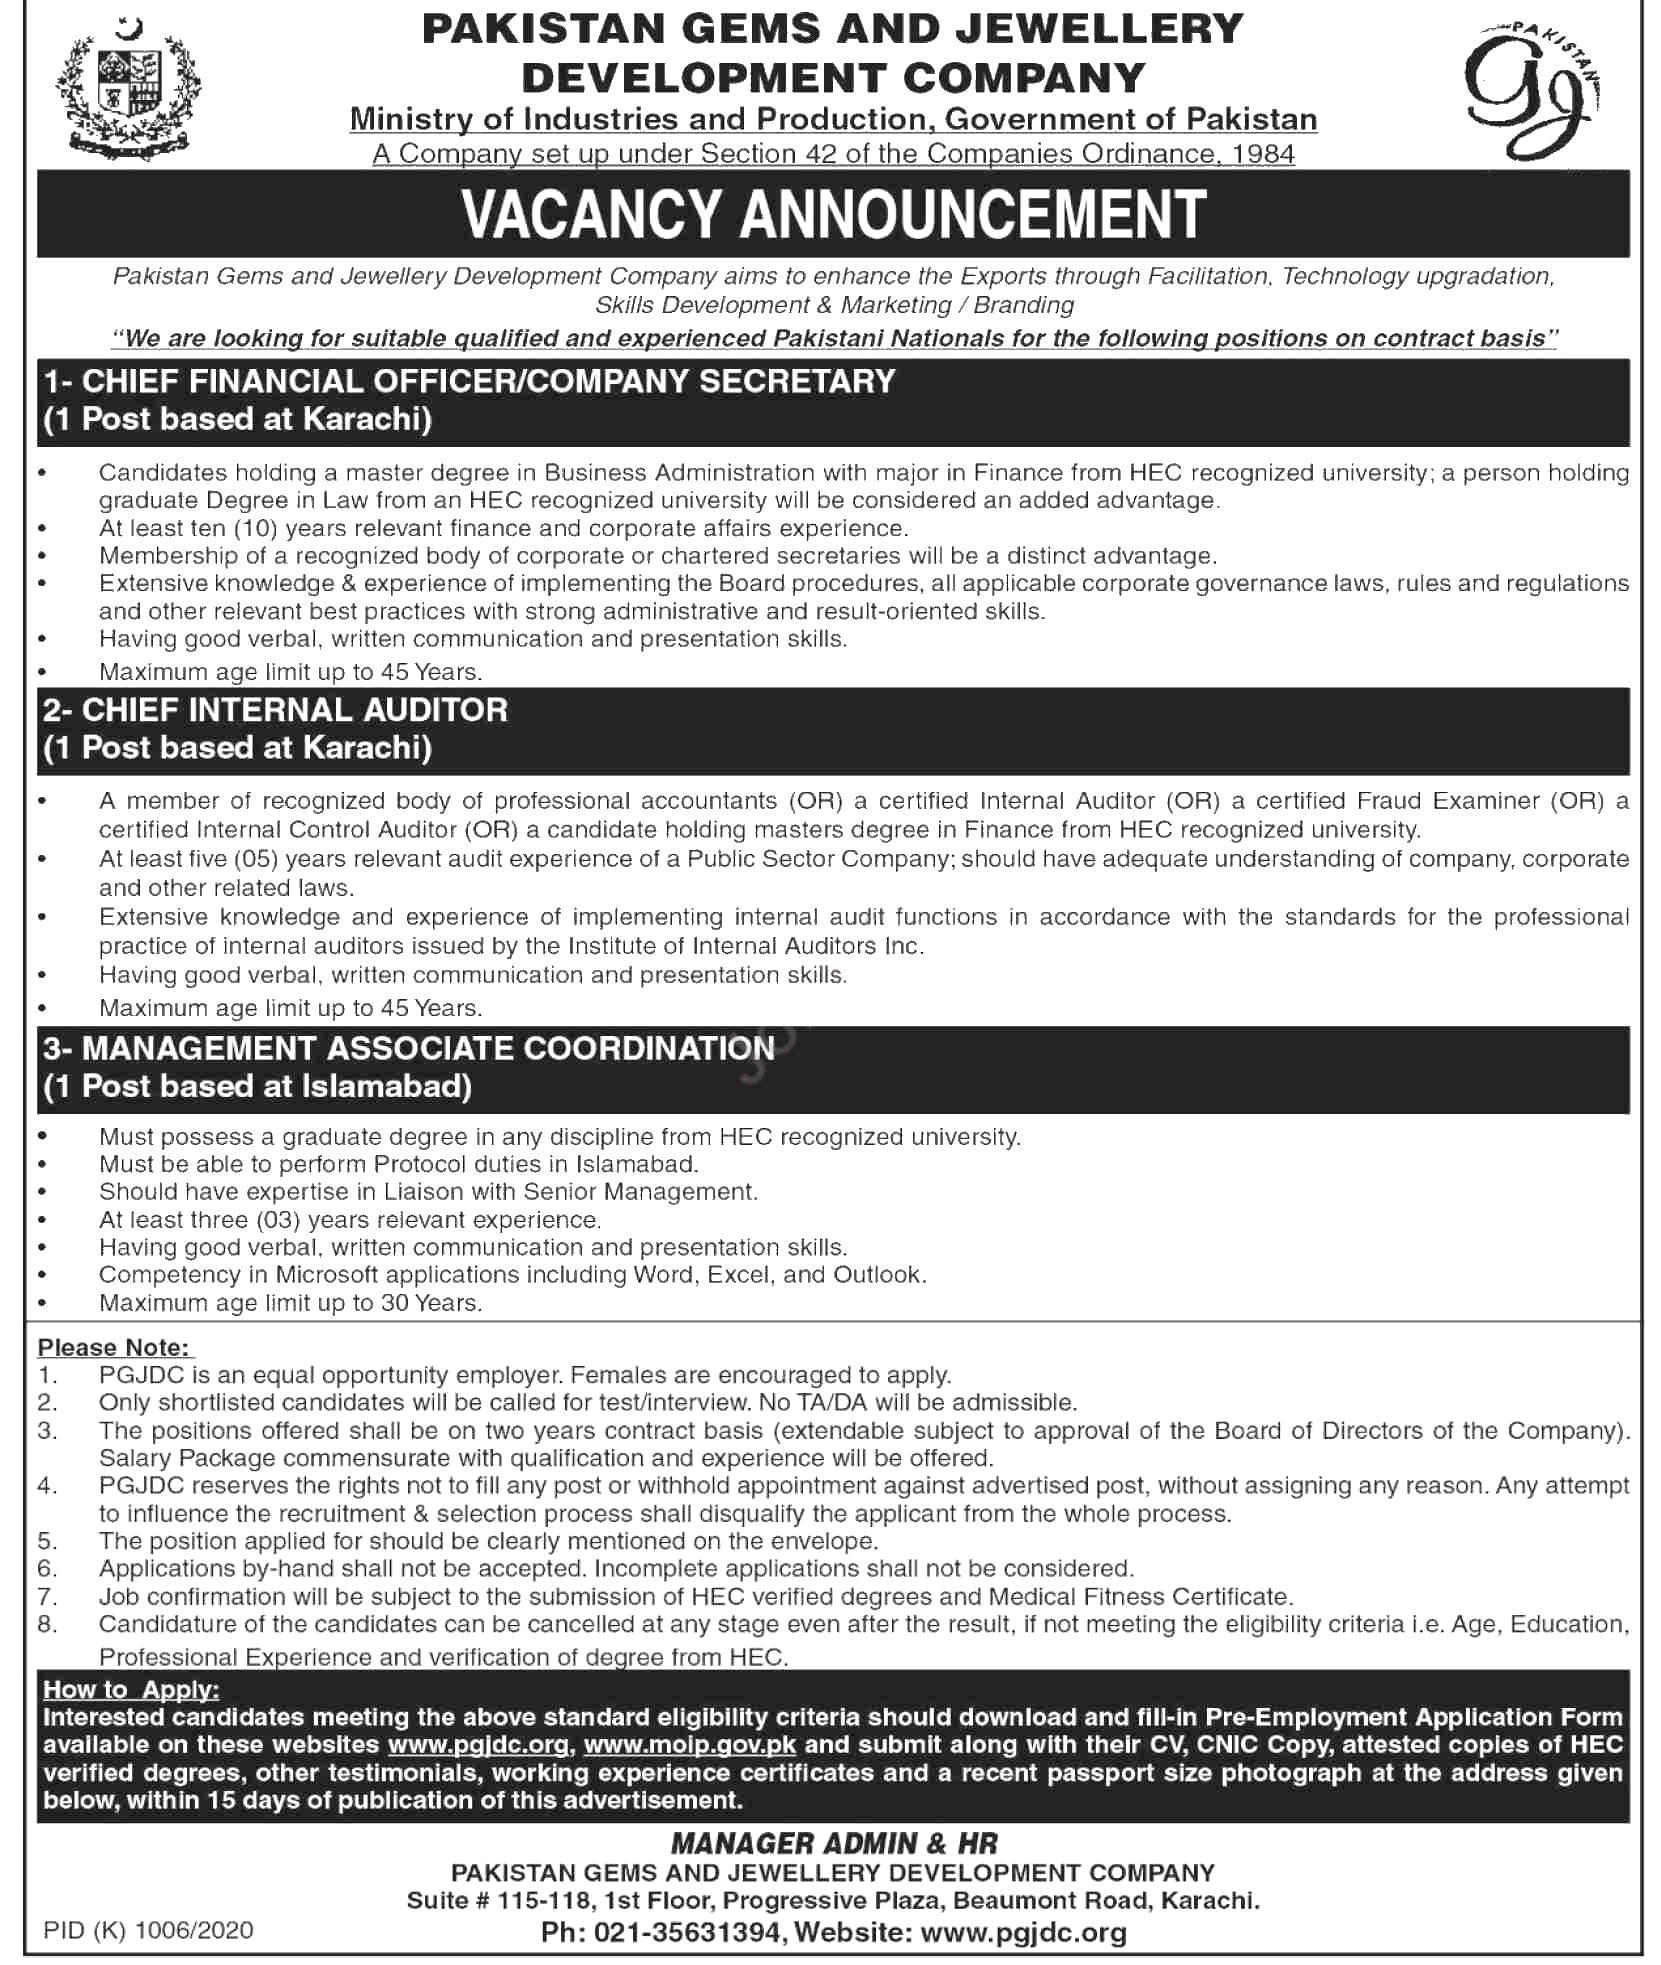 Jobs in Pakistan Gems & Jewellery Development Company PGJDC 14 October, 2020